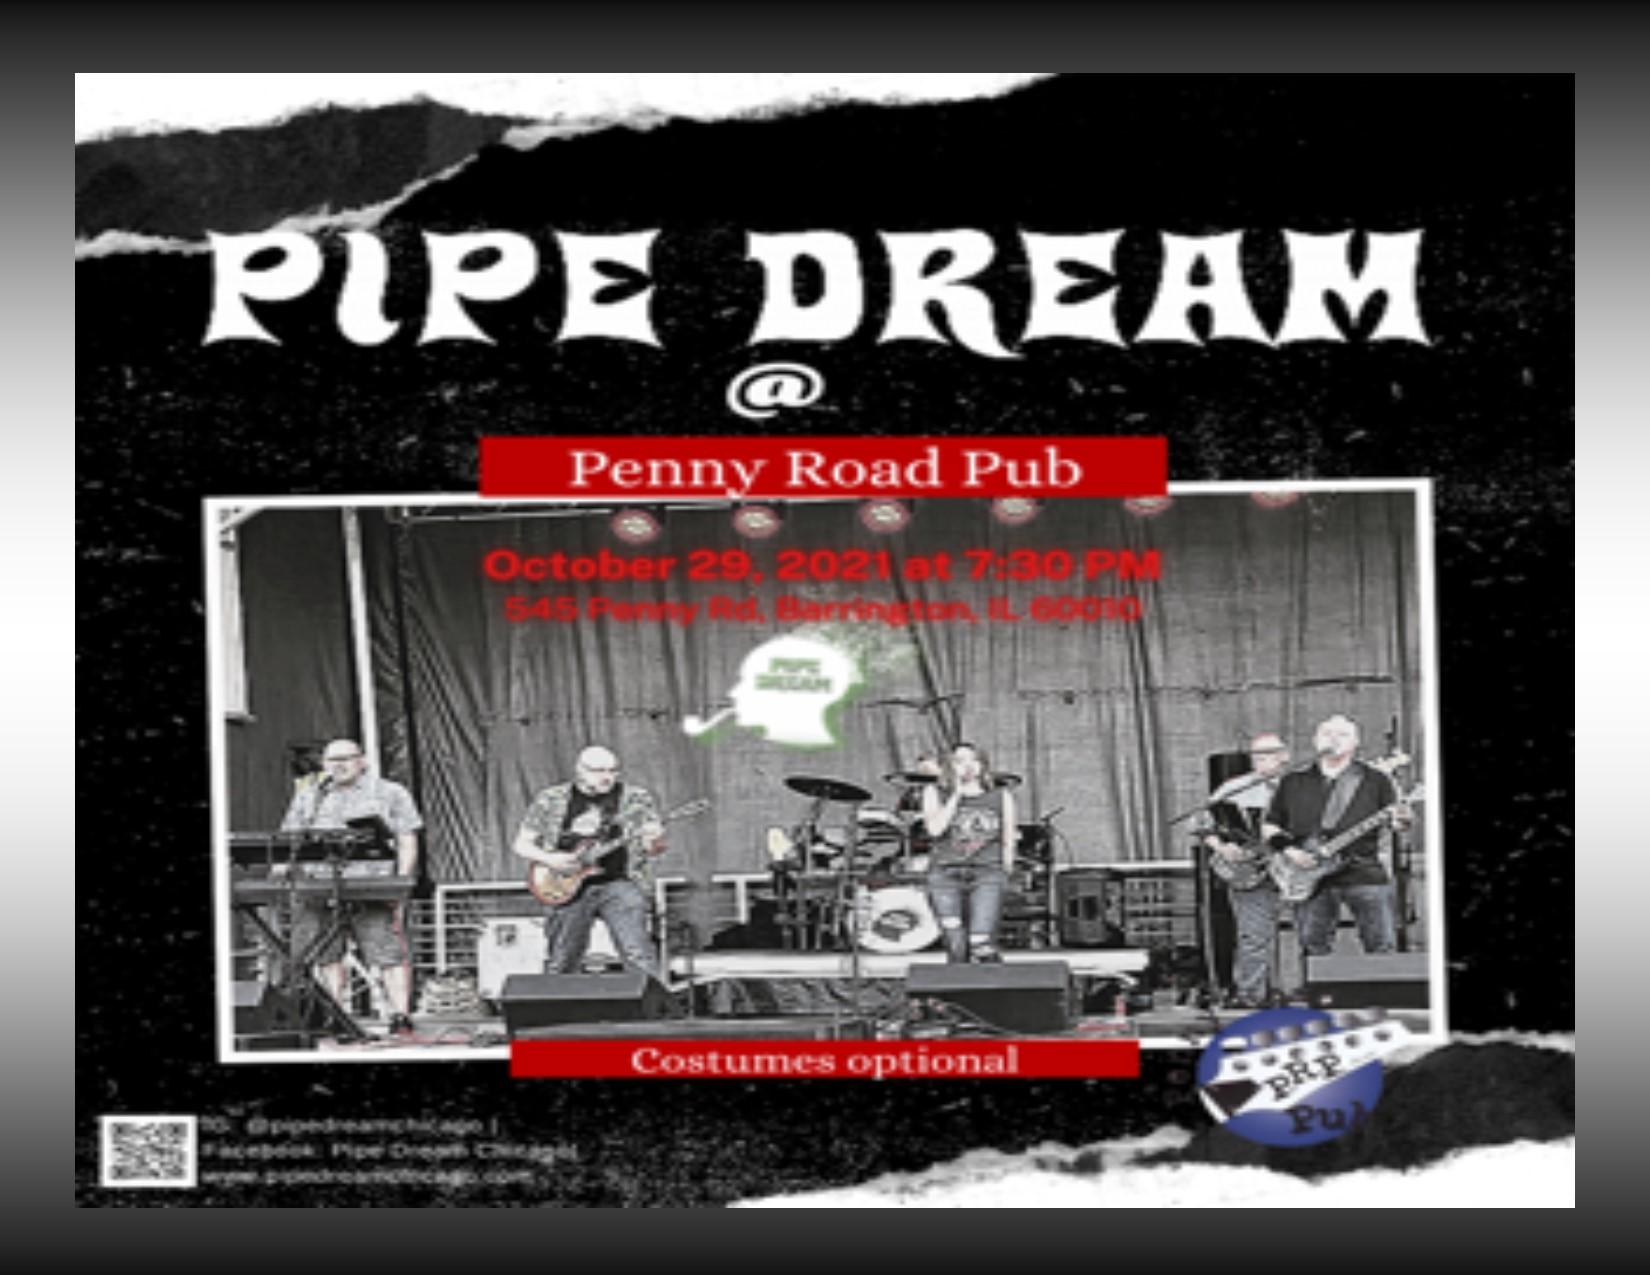 Pipe Dream Chicago